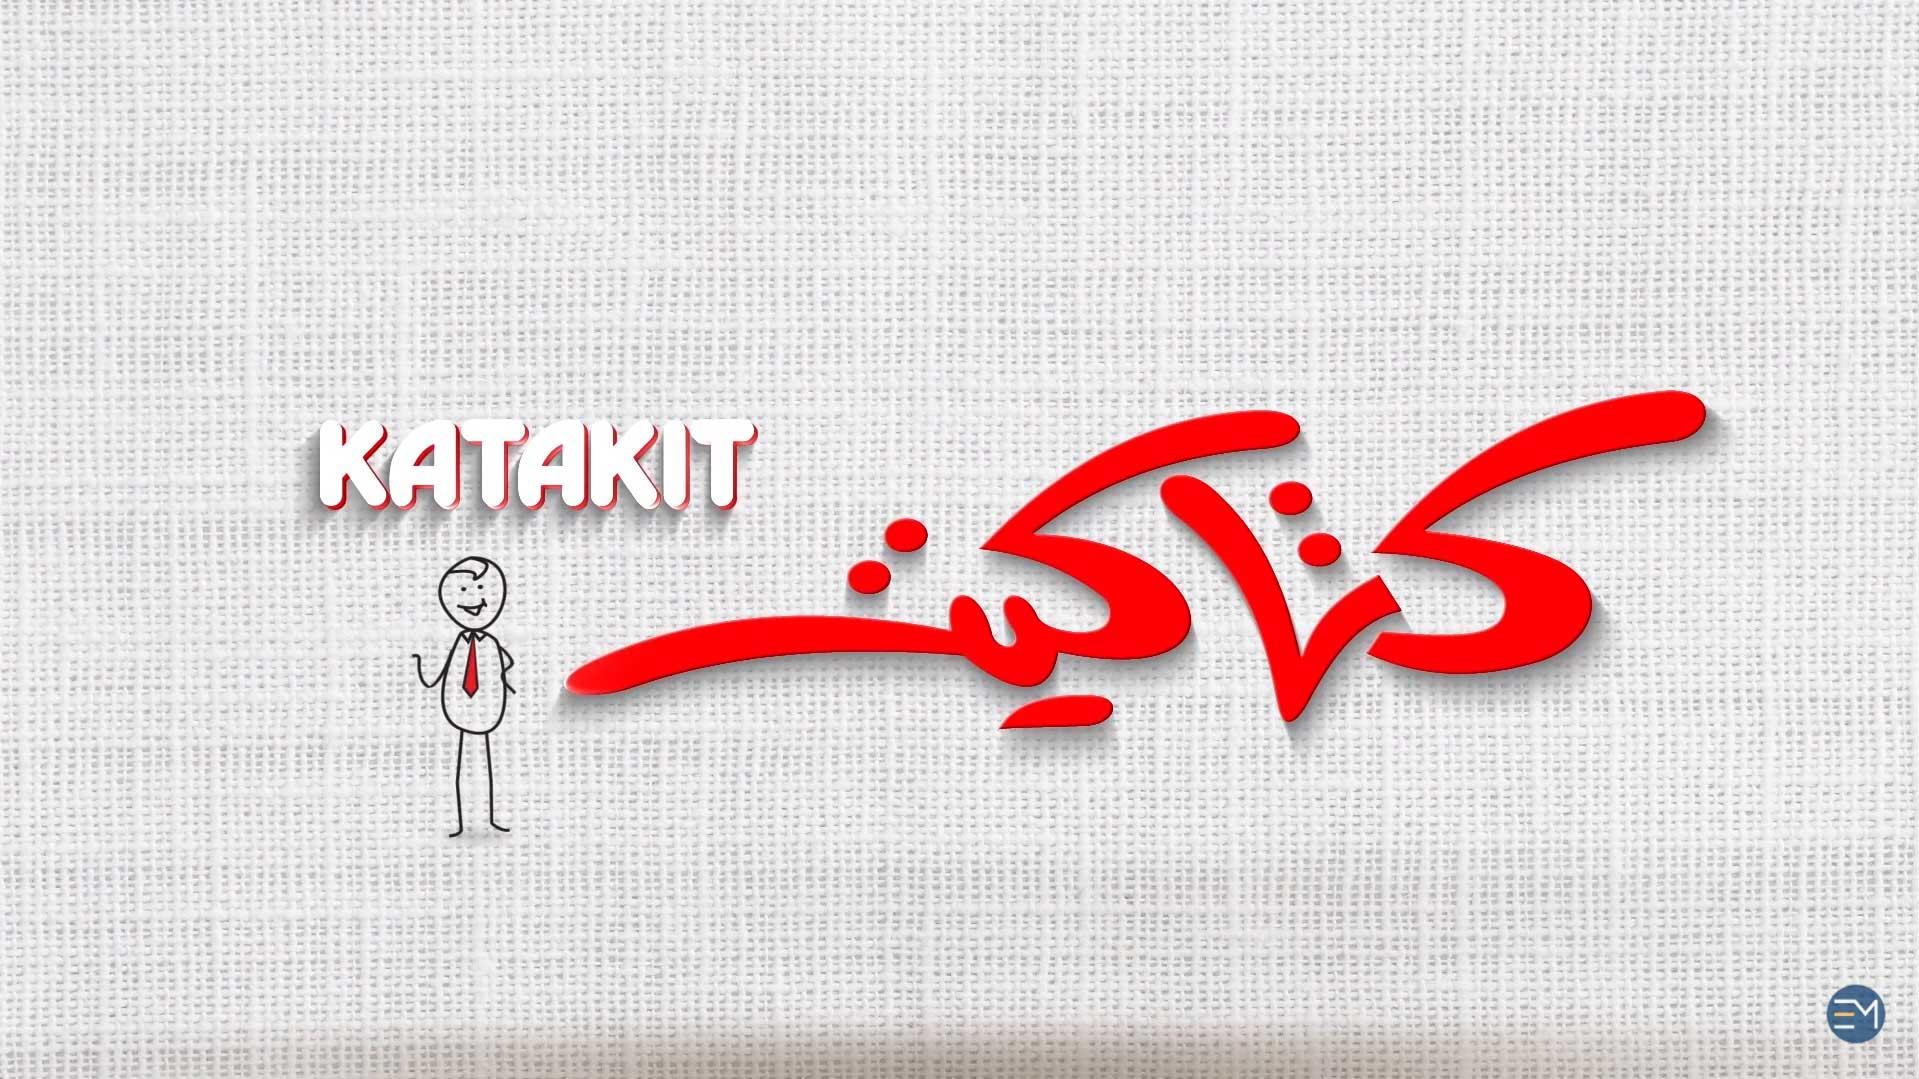 Katakit 1 - فيديوهات الرسوم المتحركة -